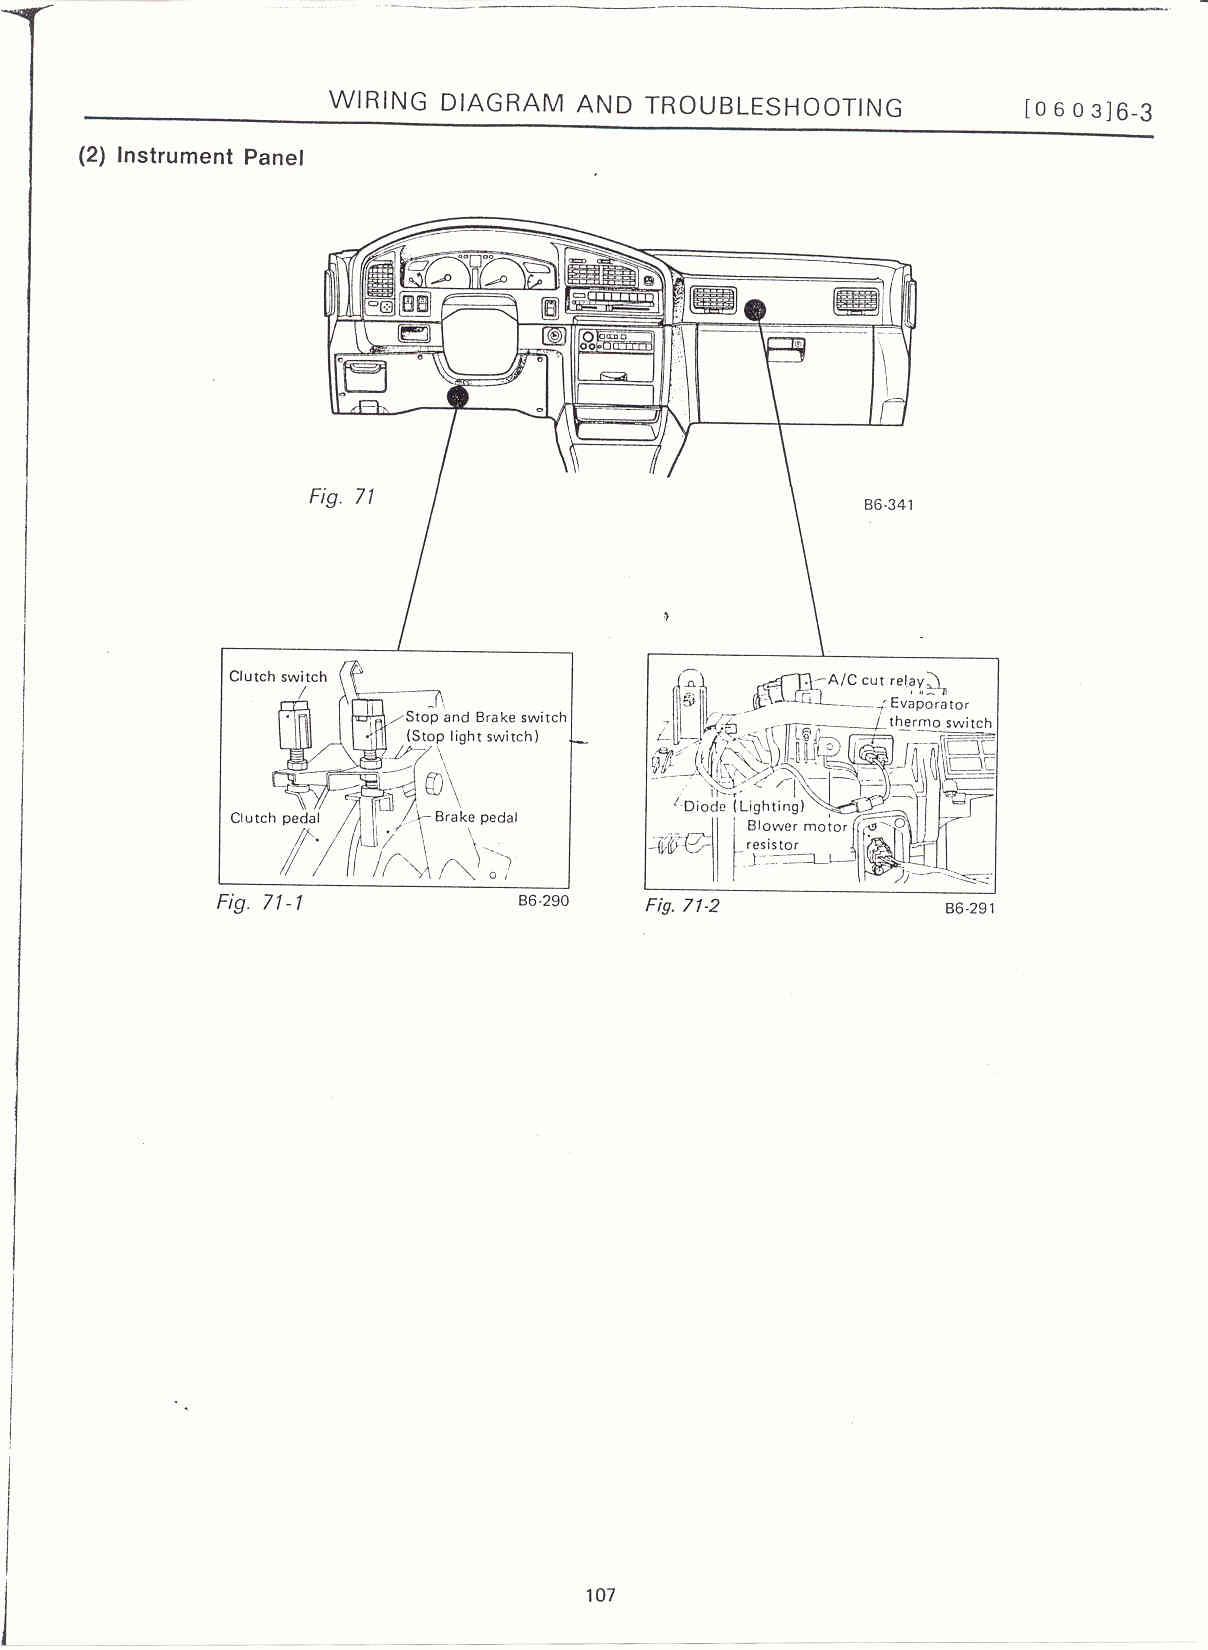 Diagram Subaru Starter Relay Location File La12421 on ecu wiring diagram, software wiring diagram, abs wiring diagram, honda wiring diagram, transmission wiring diagram, aldl wiring diagram, nissan wiring diagram, obdii wiring diagram, chevy s10 cluster wiring diagram, pcm wiring diagram, obd1 wiring diagram, egr wiring diagram, computer wiring diagram, obd0 wiring diagram, usb wiring diagram, engine wiring diagram, data wiring diagram, sensor wiring diagram, auto wiring diagram, wifi wiring diagram,